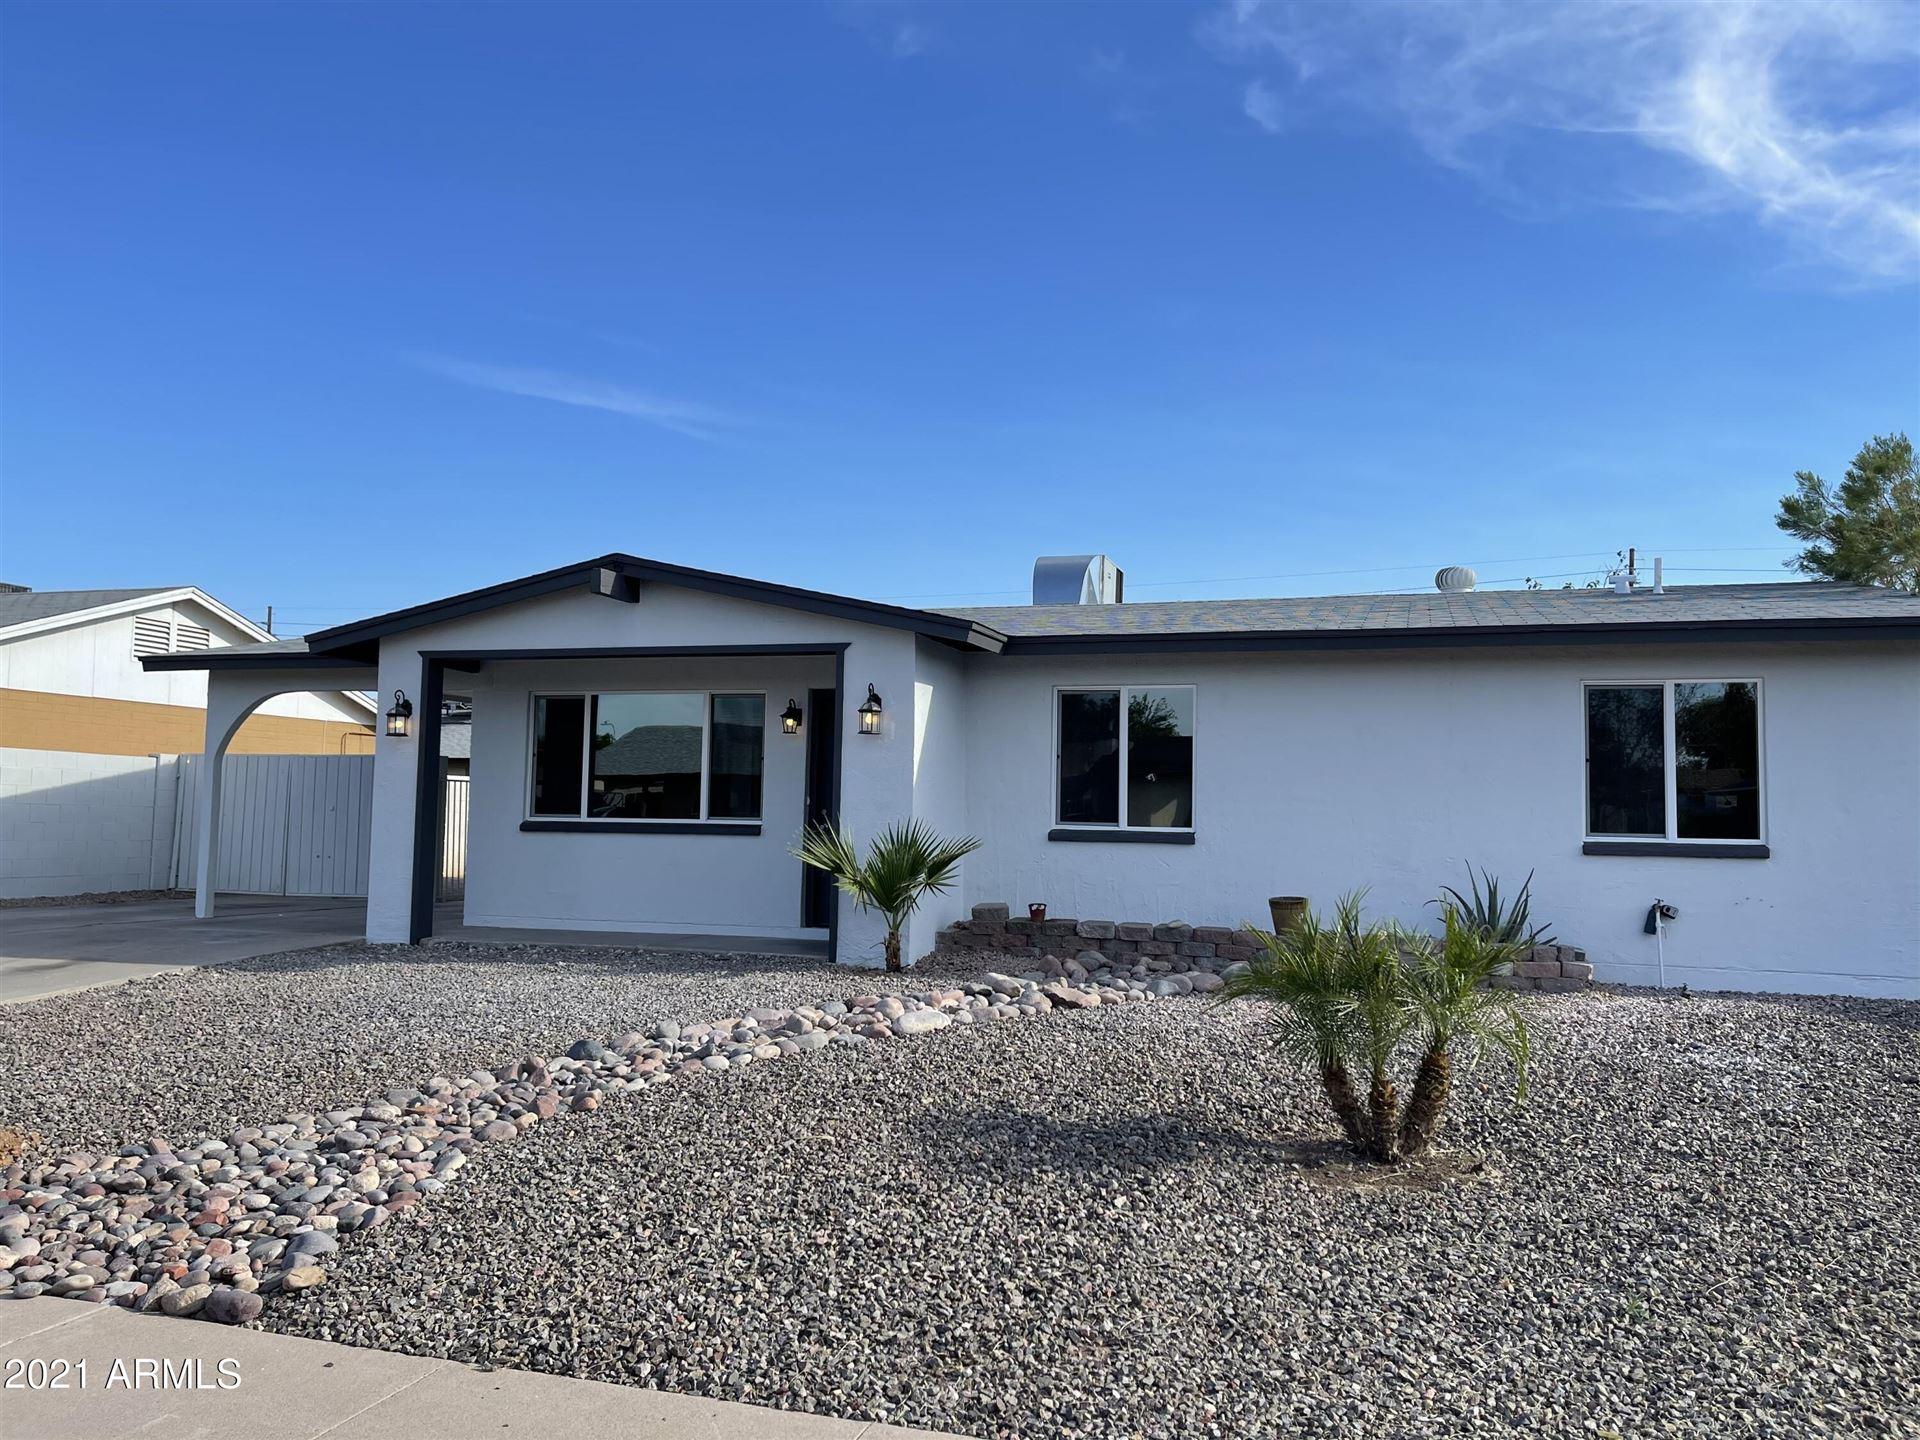 Photo of 4635 W EVA Street, Glendale, AZ 85302 (MLS # 6296121)